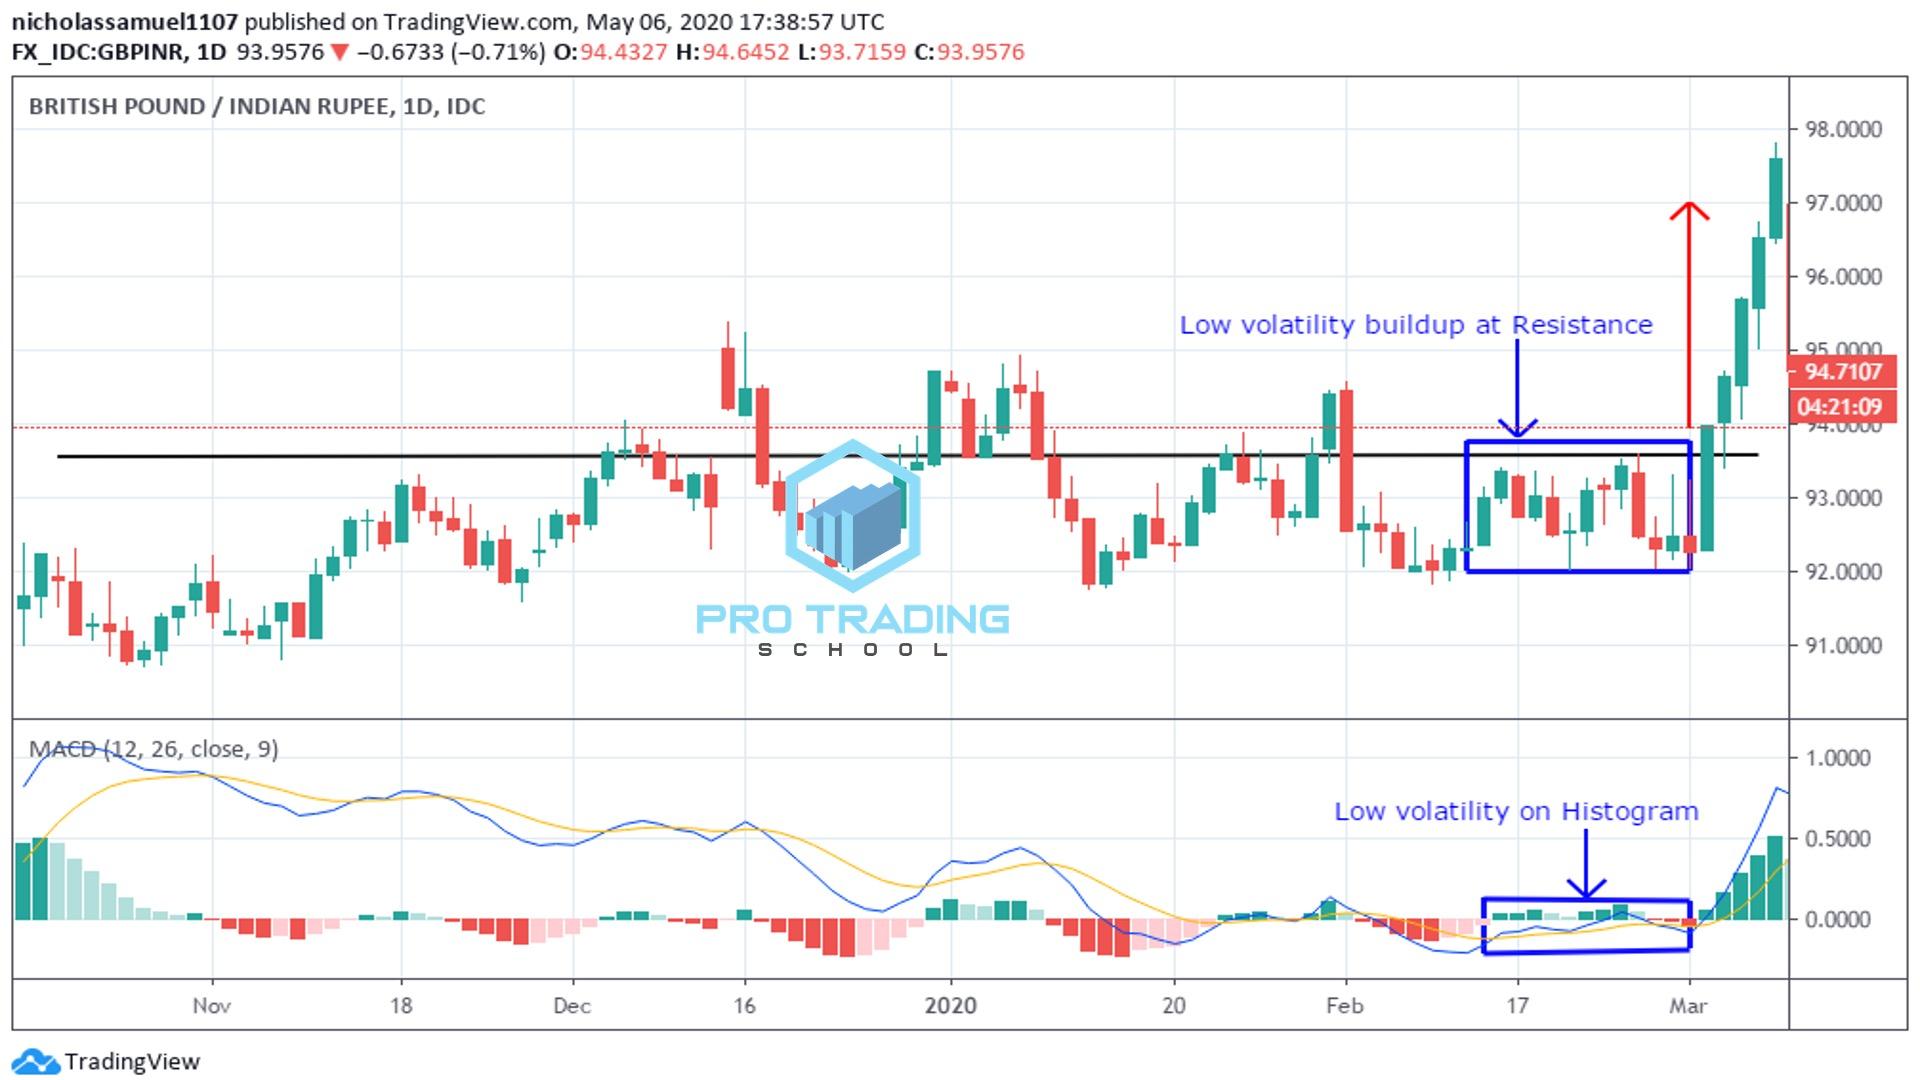 macd-indicator-and-volatility